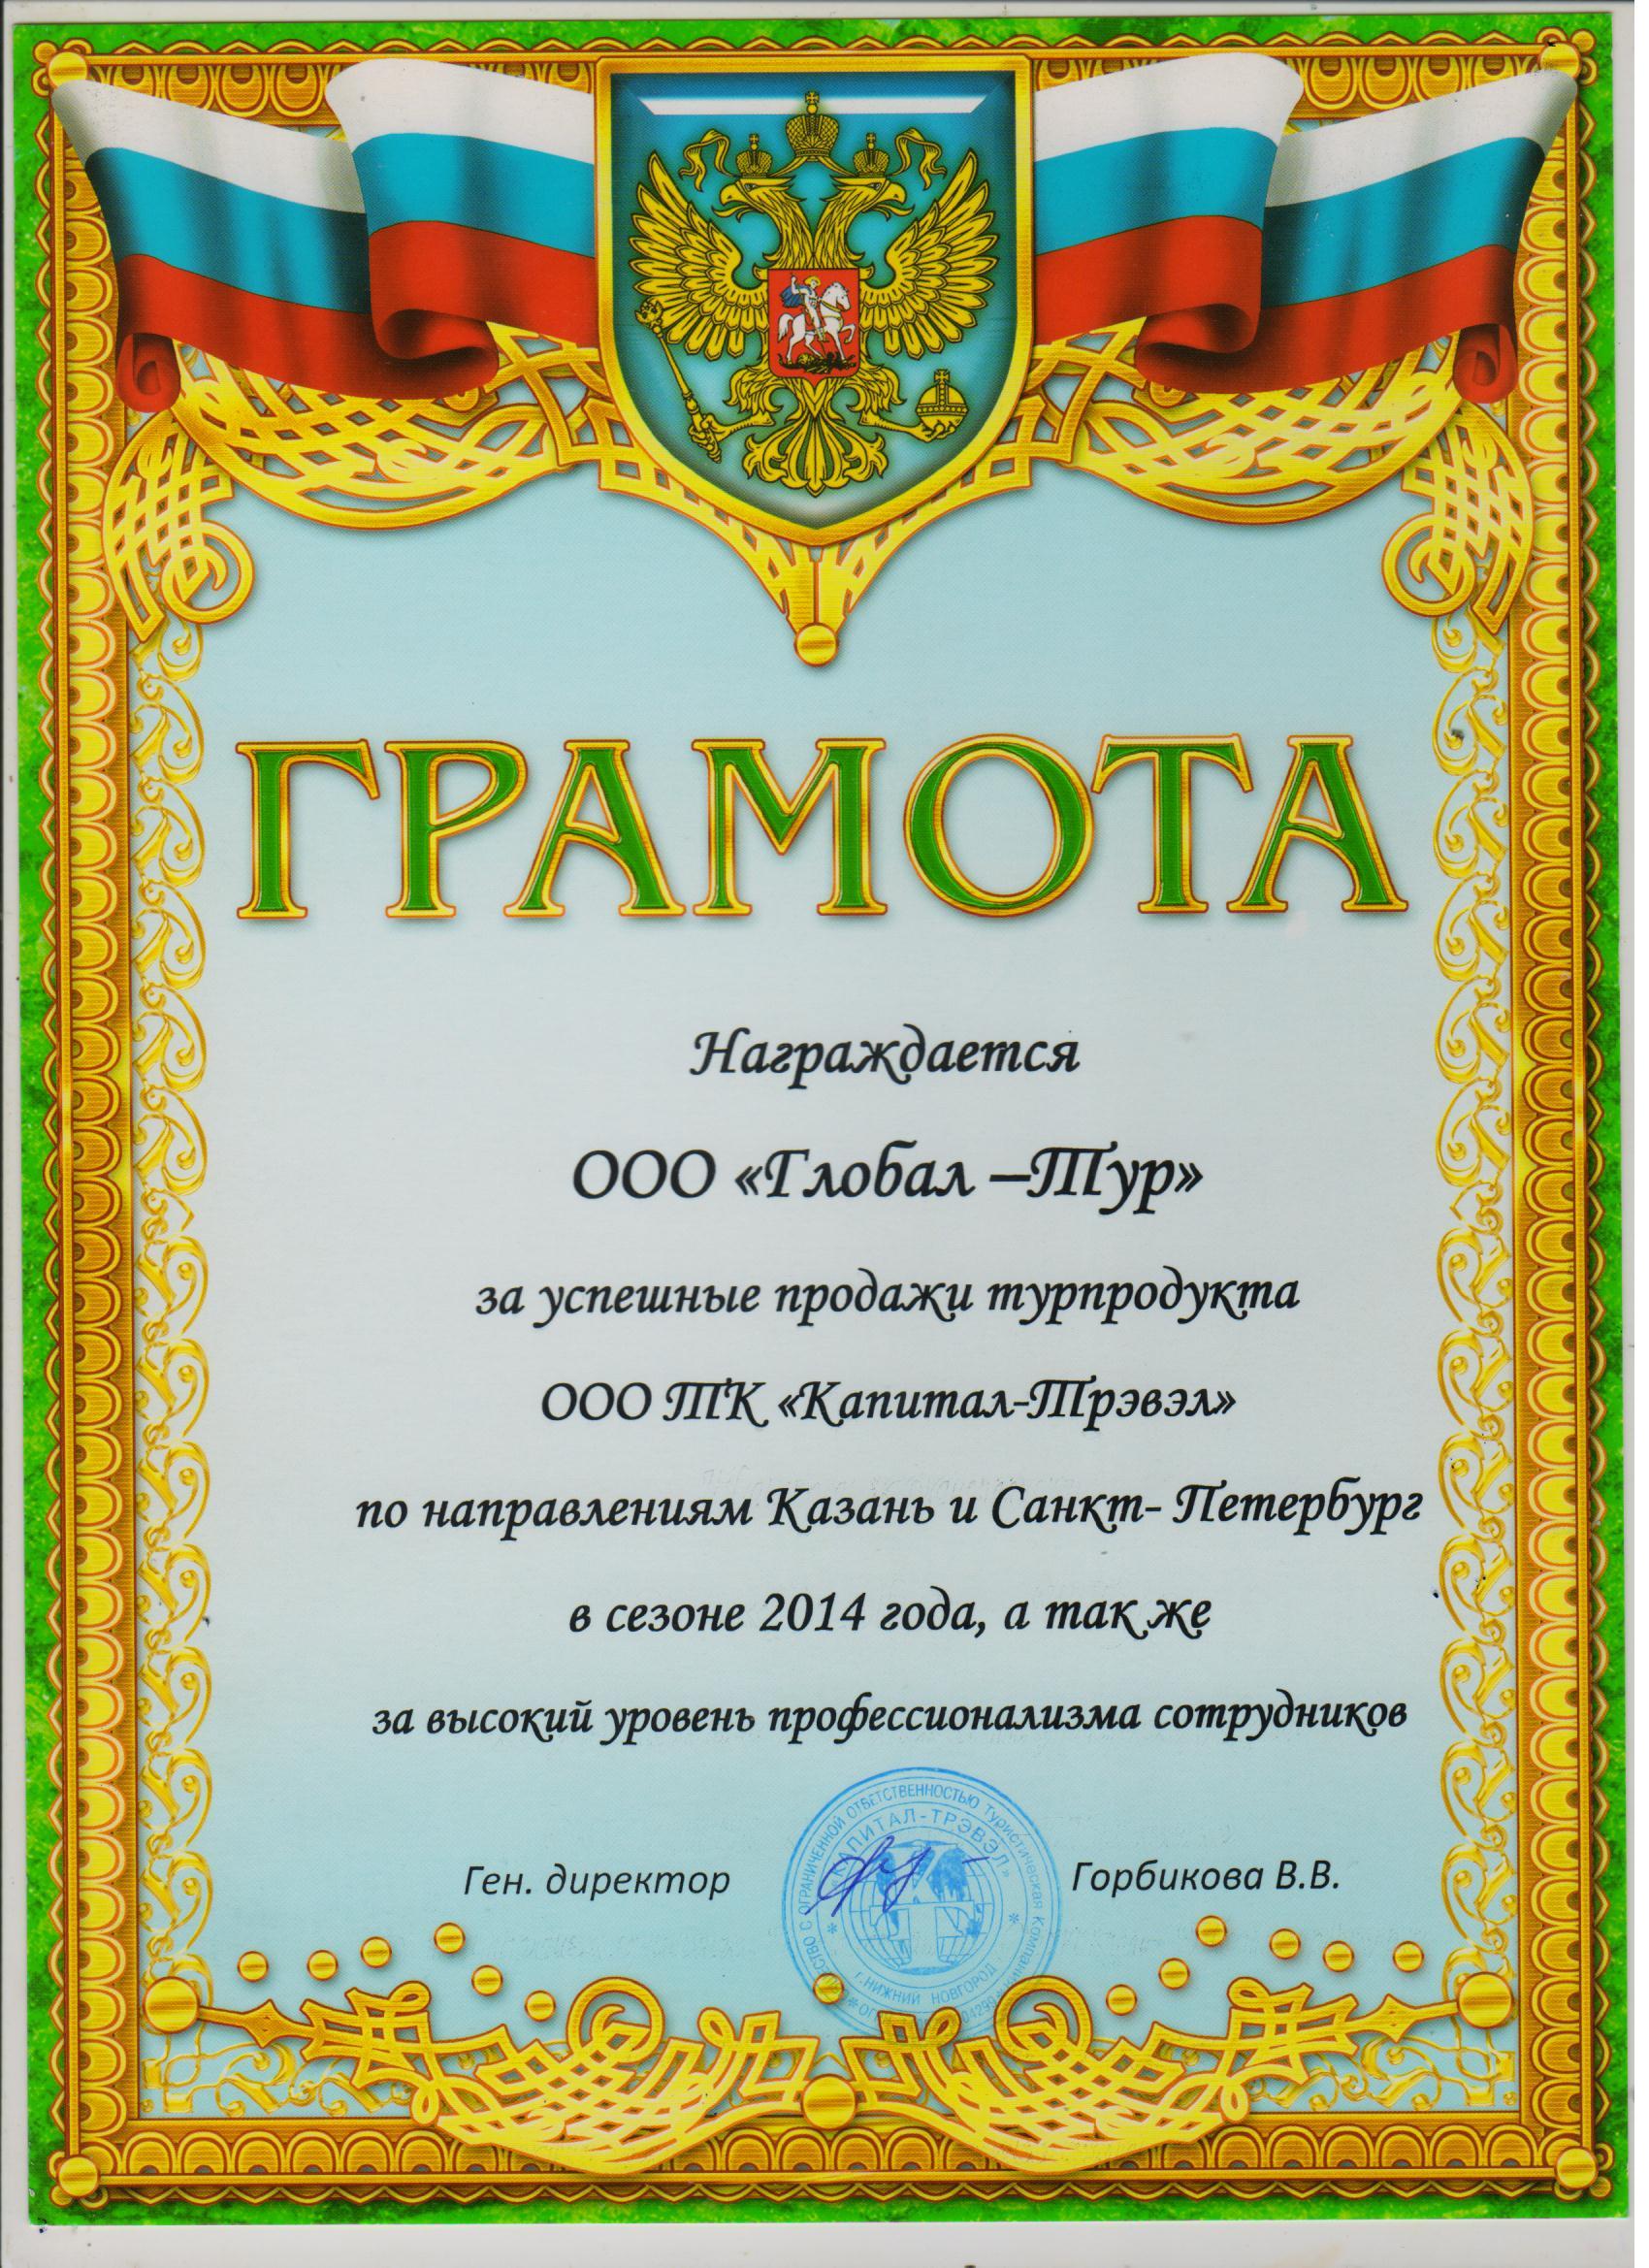 ГРАМОТА КАПИТАЛ 001.jpg